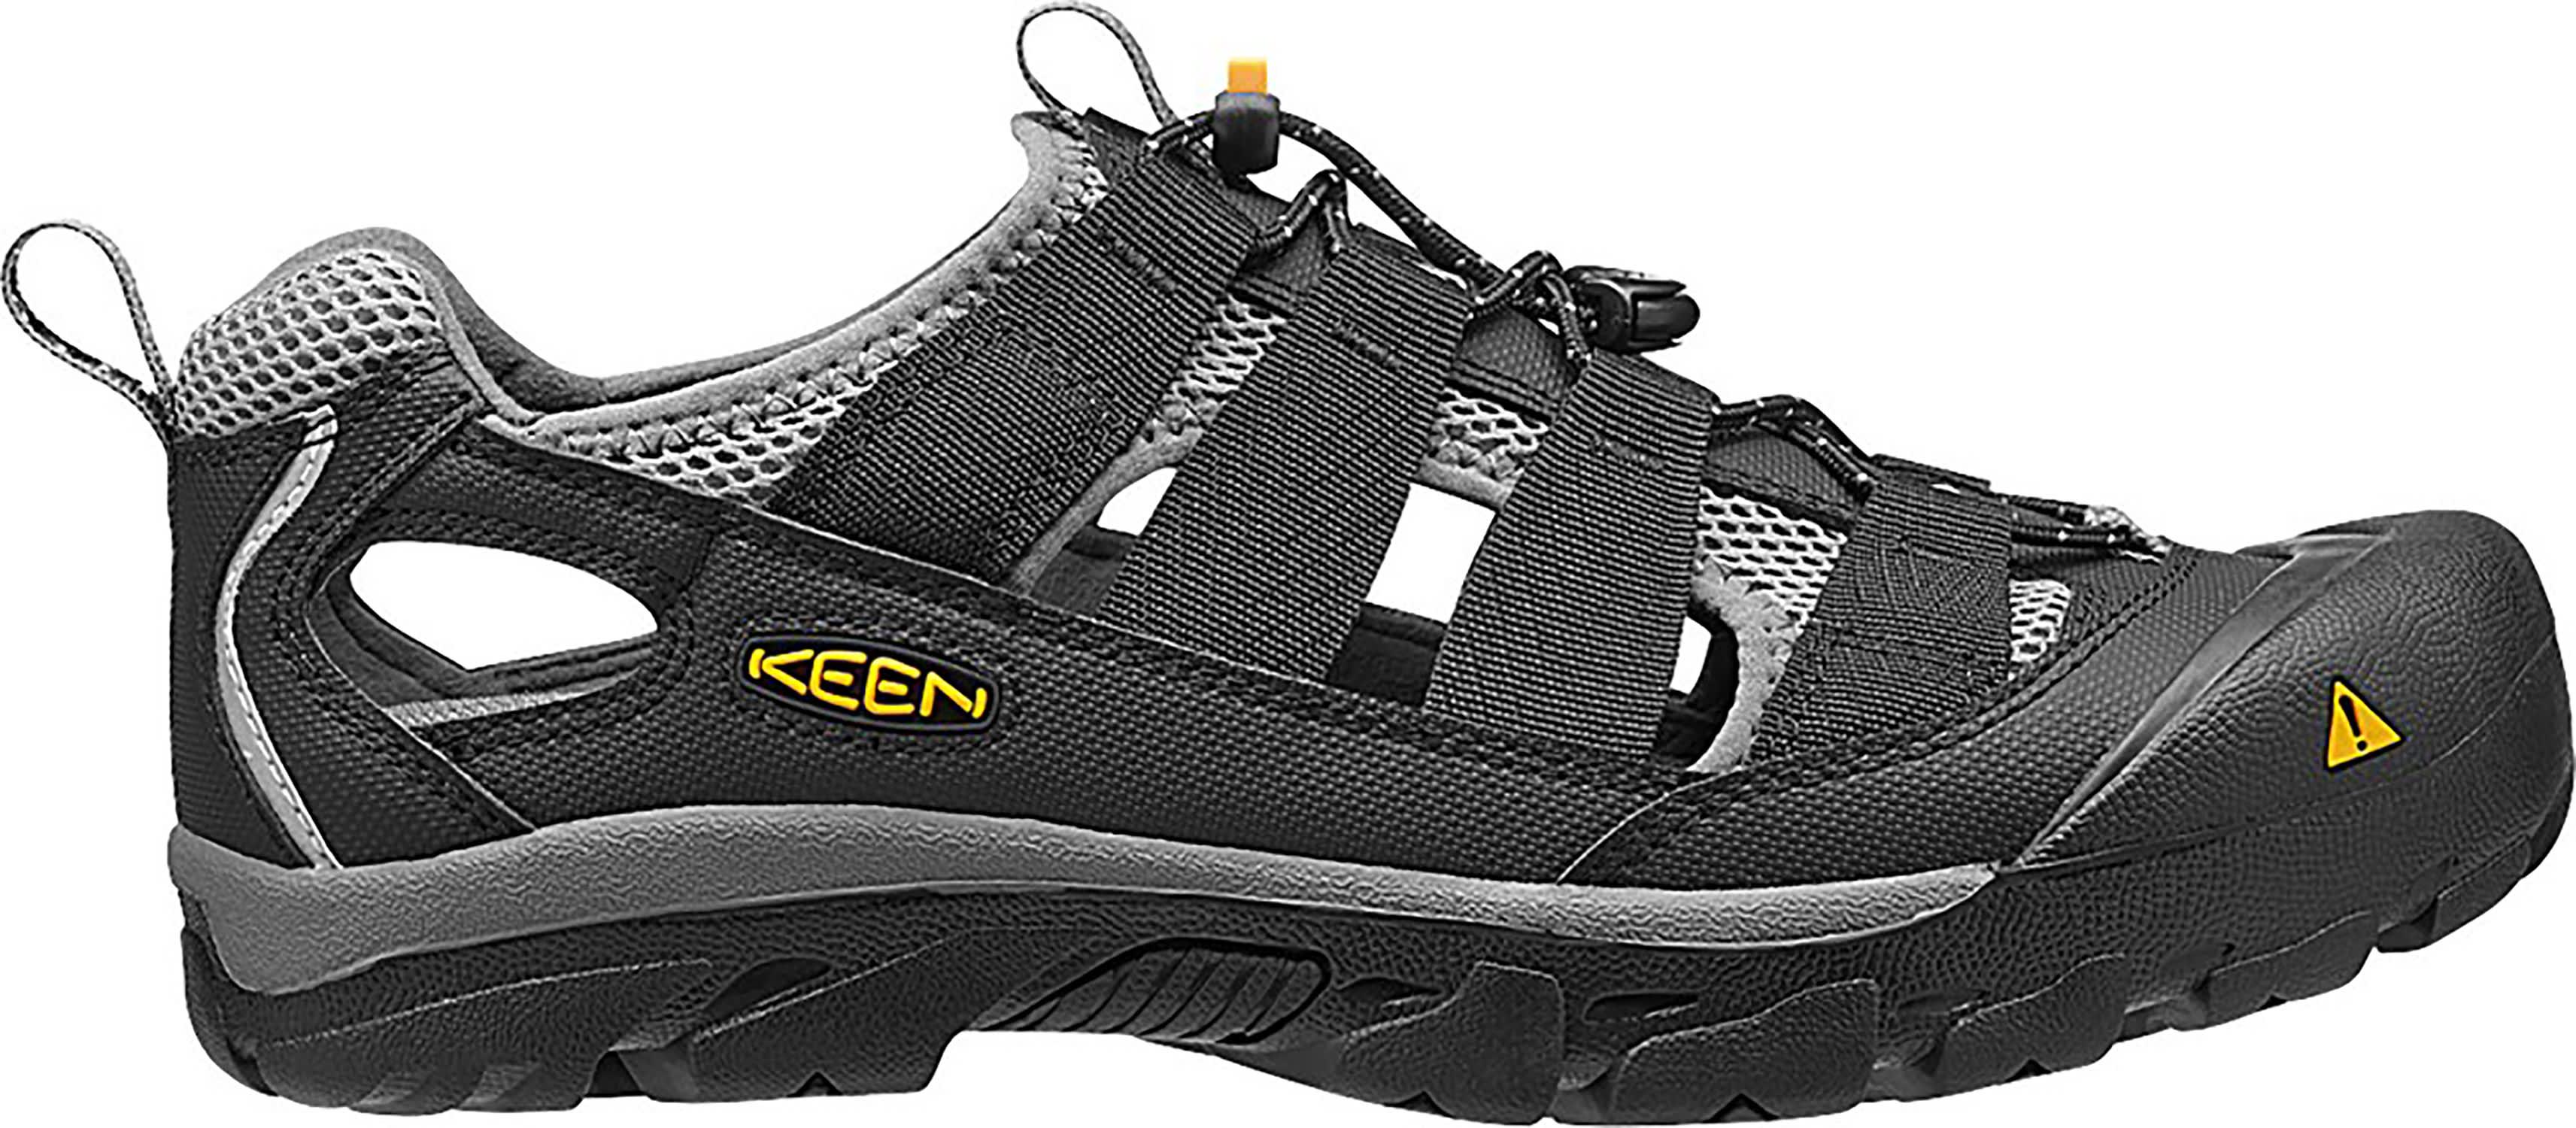 Sandals cycling shoes - Keen Commuter 4 Bike Shoes Thumbnail 1